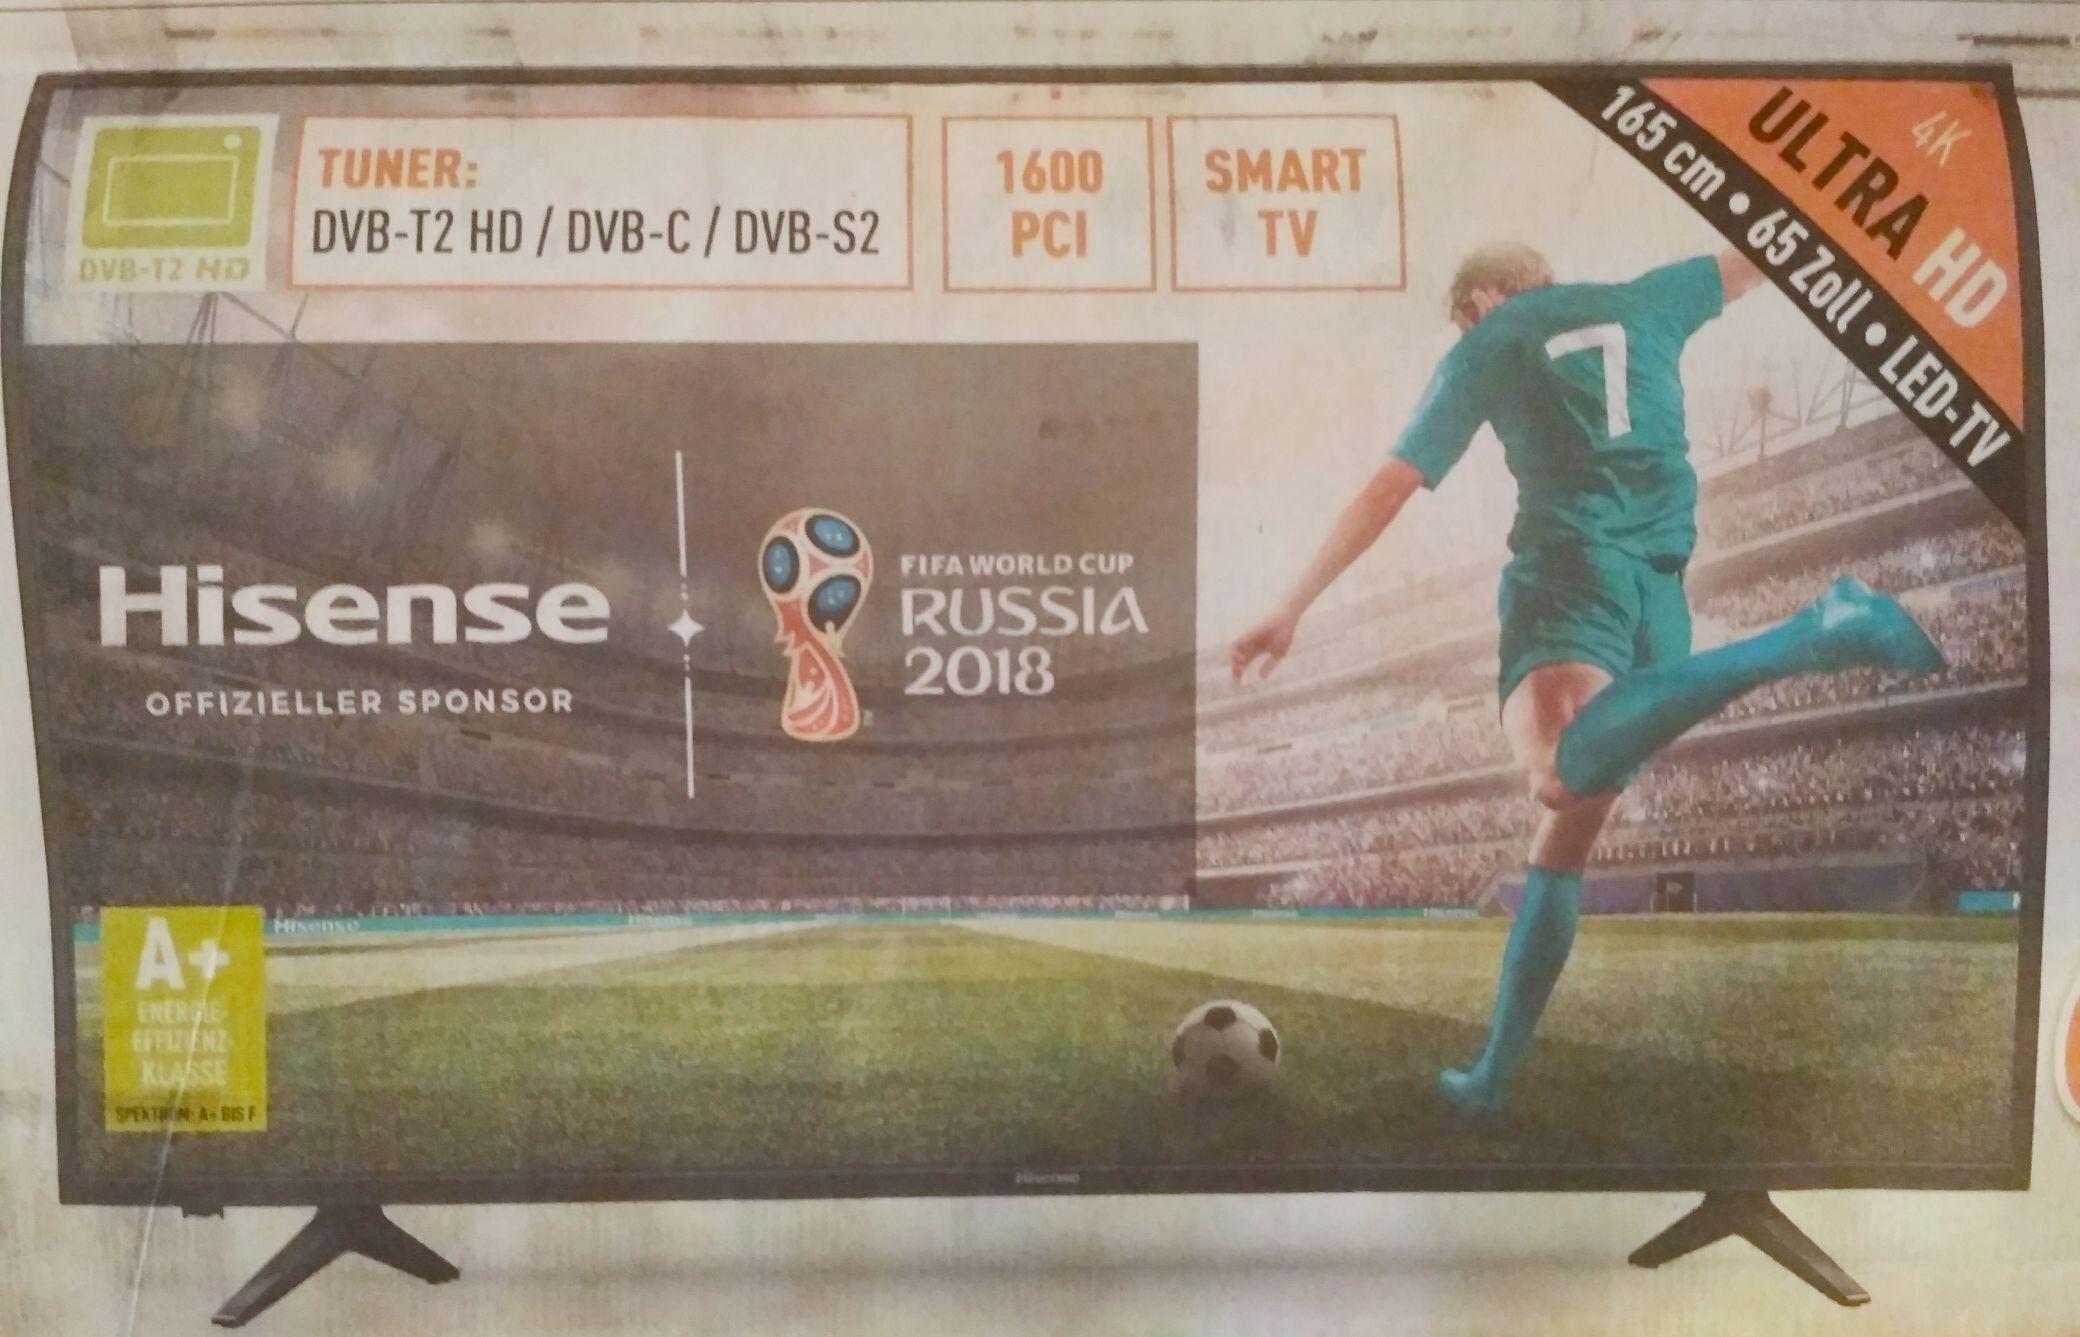 "Hisense H65A6100 65"" UHD TV 60Hz HDR8+FRC Quadcore [Lokal Berlet NRW 699€ oder online 738,90€ inkl. Versand]"